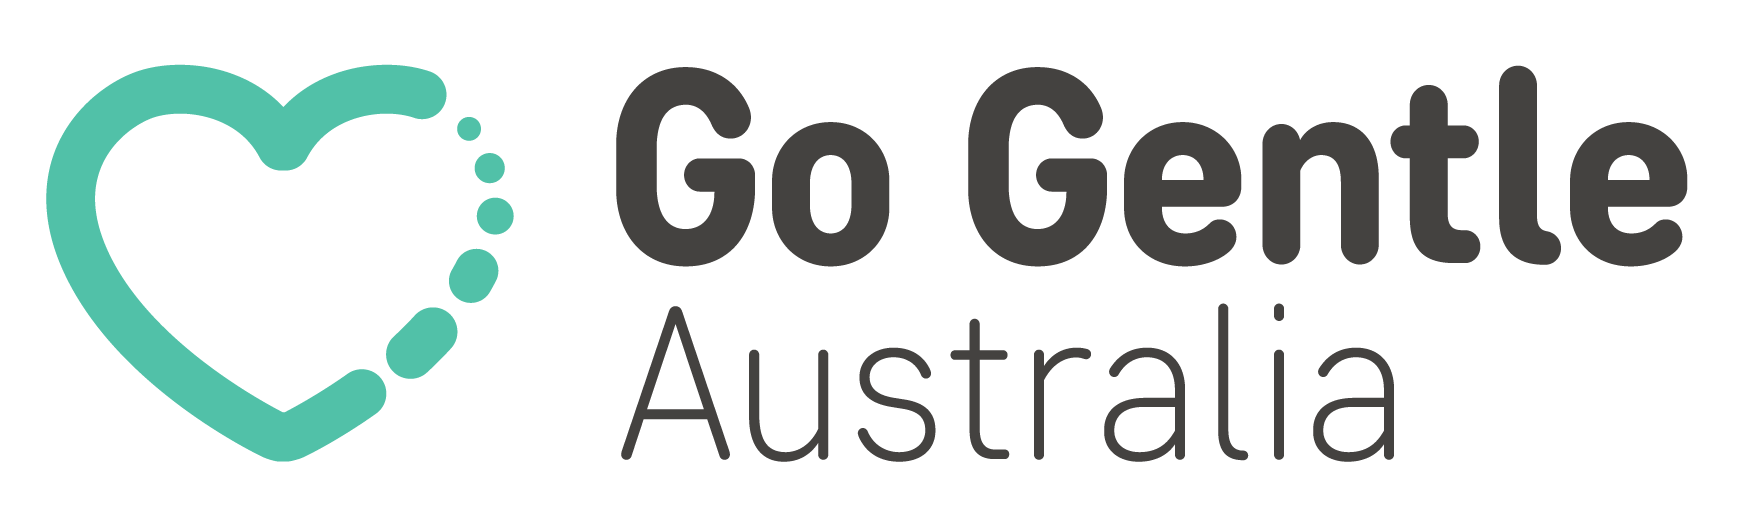 www.gogentleaustralia.org.au